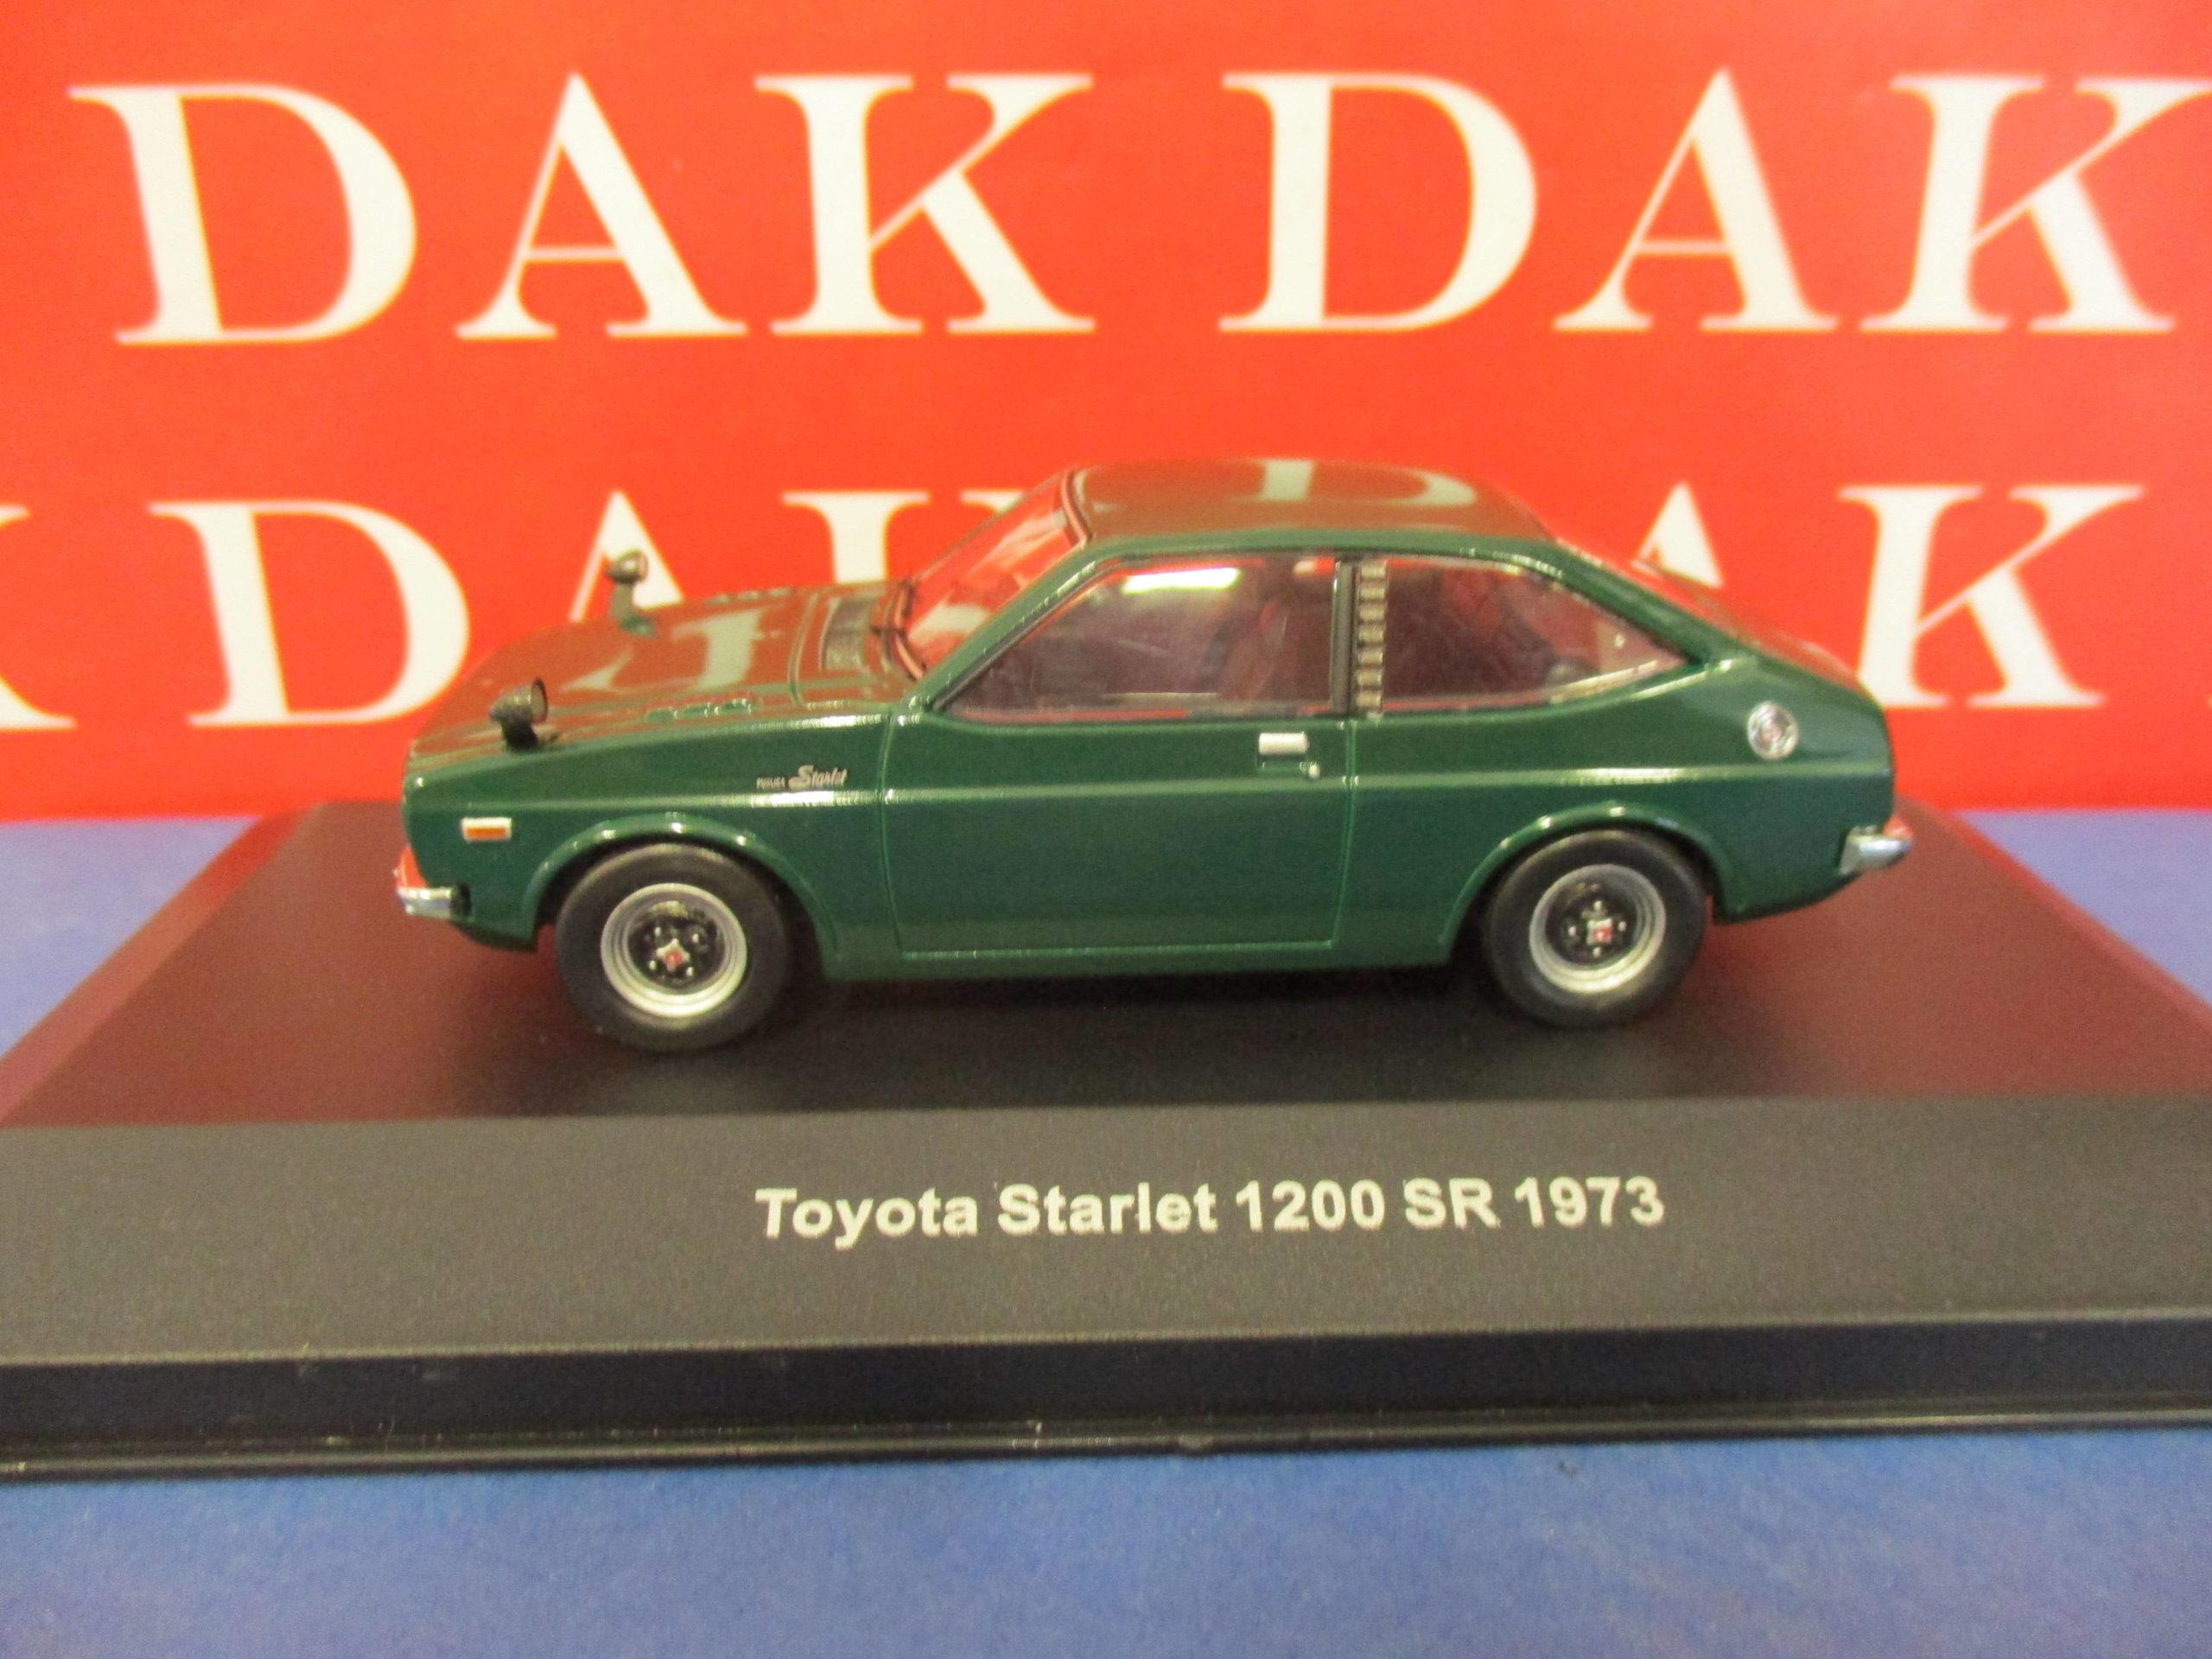 Toyota Starlet 1200 Sr 1973 Green Metallic Diecast 1:43 Ixo